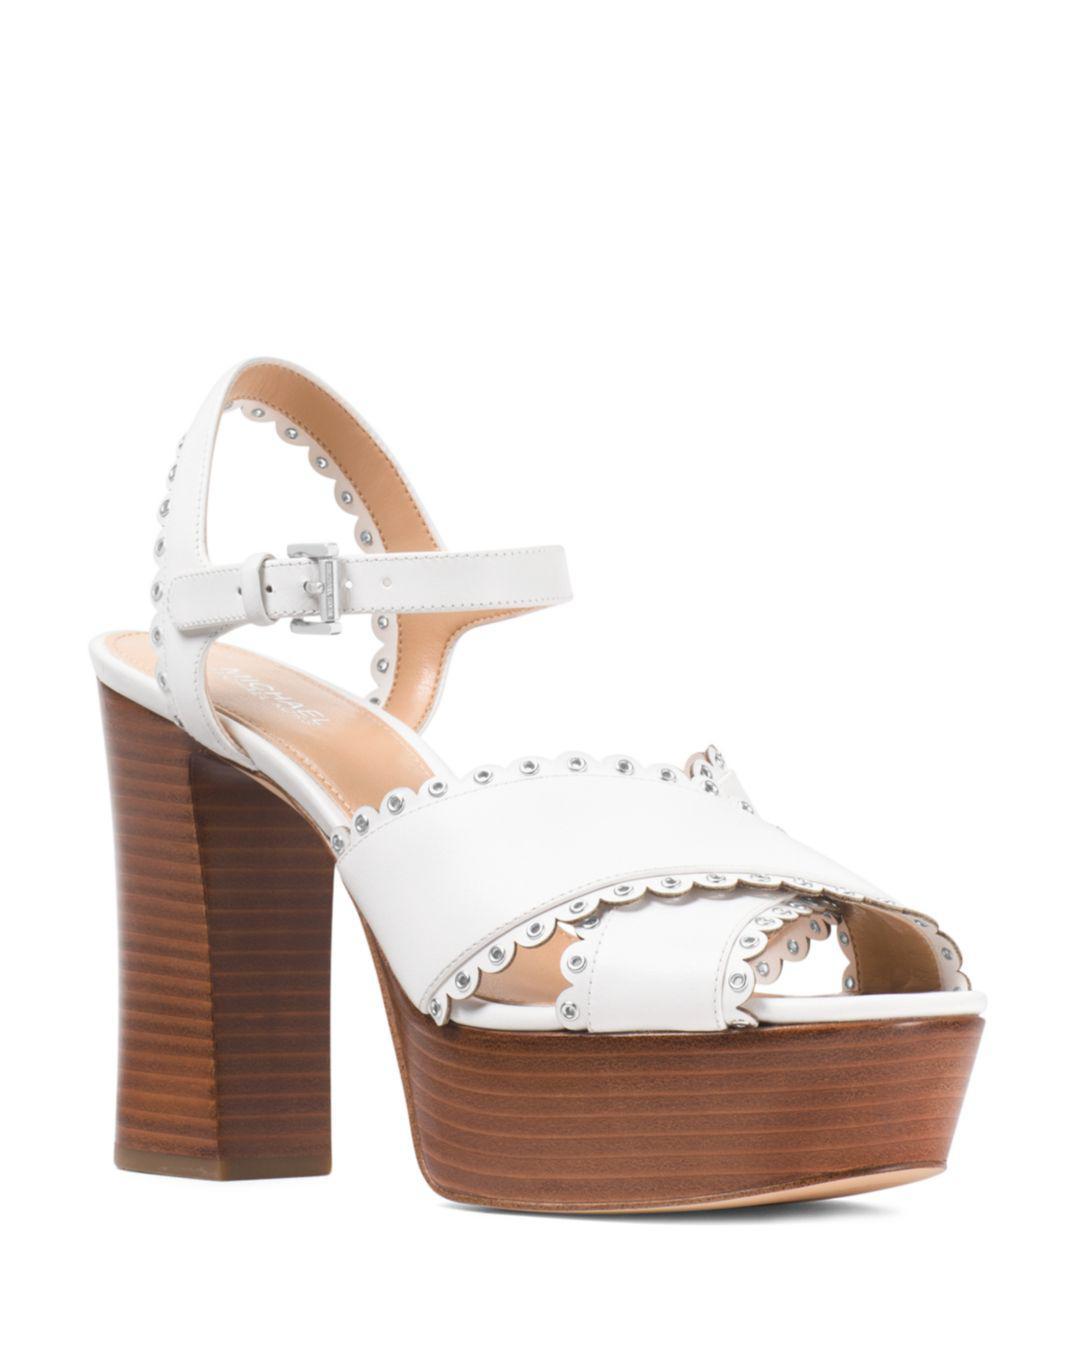 62c23ea0e7f Lyst - MICHAEL Michael Kors Women s Jessie Scalloped Leather ...